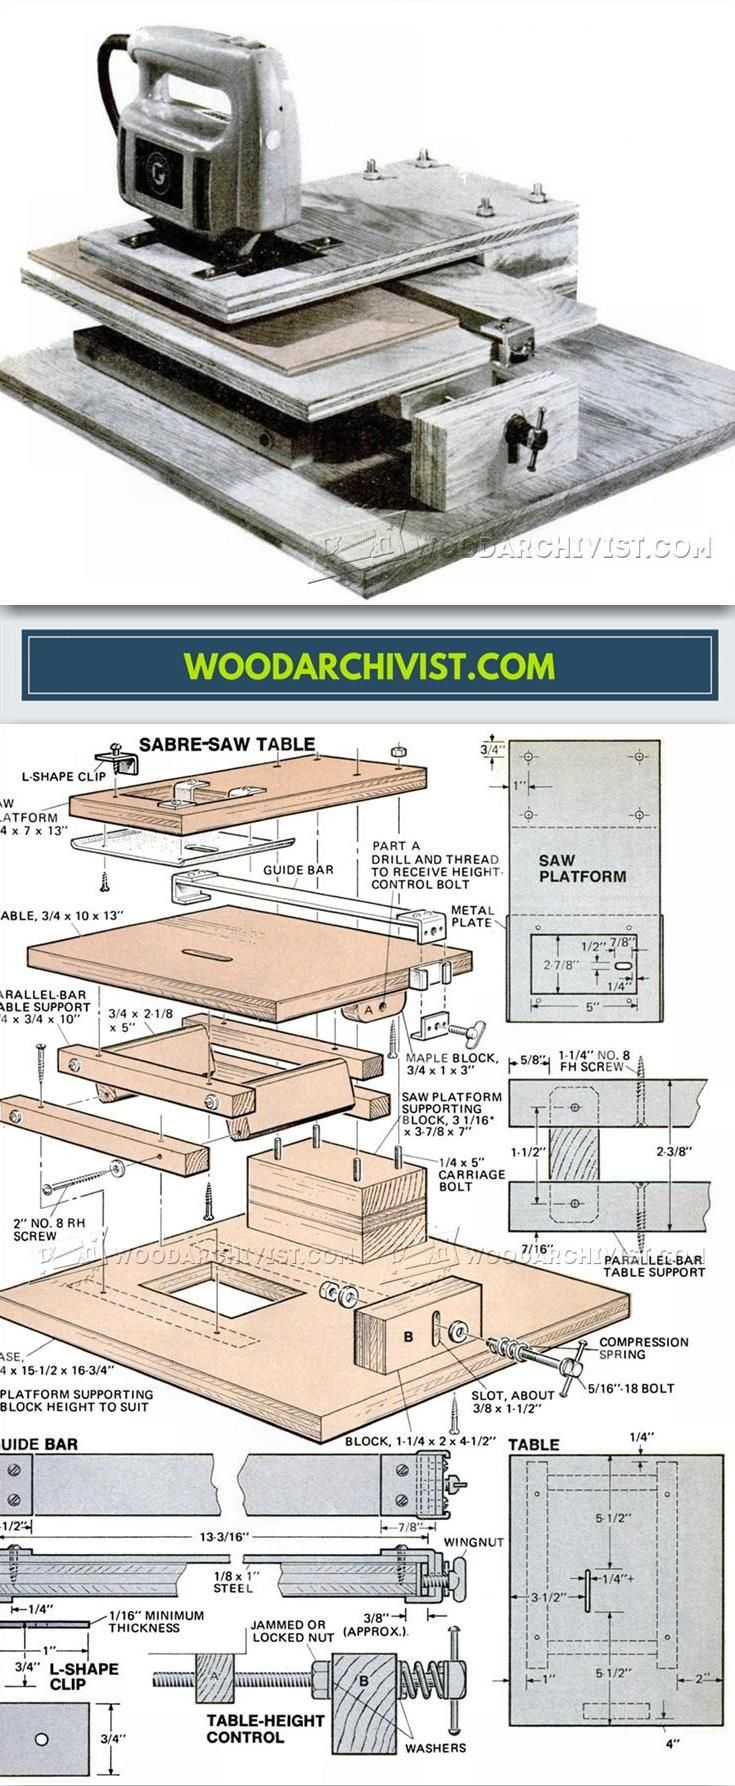 DIY Jig Saw Сircular Saw - Jig Saw Tips, Jigs and Fixtures   WoodArchivist.com